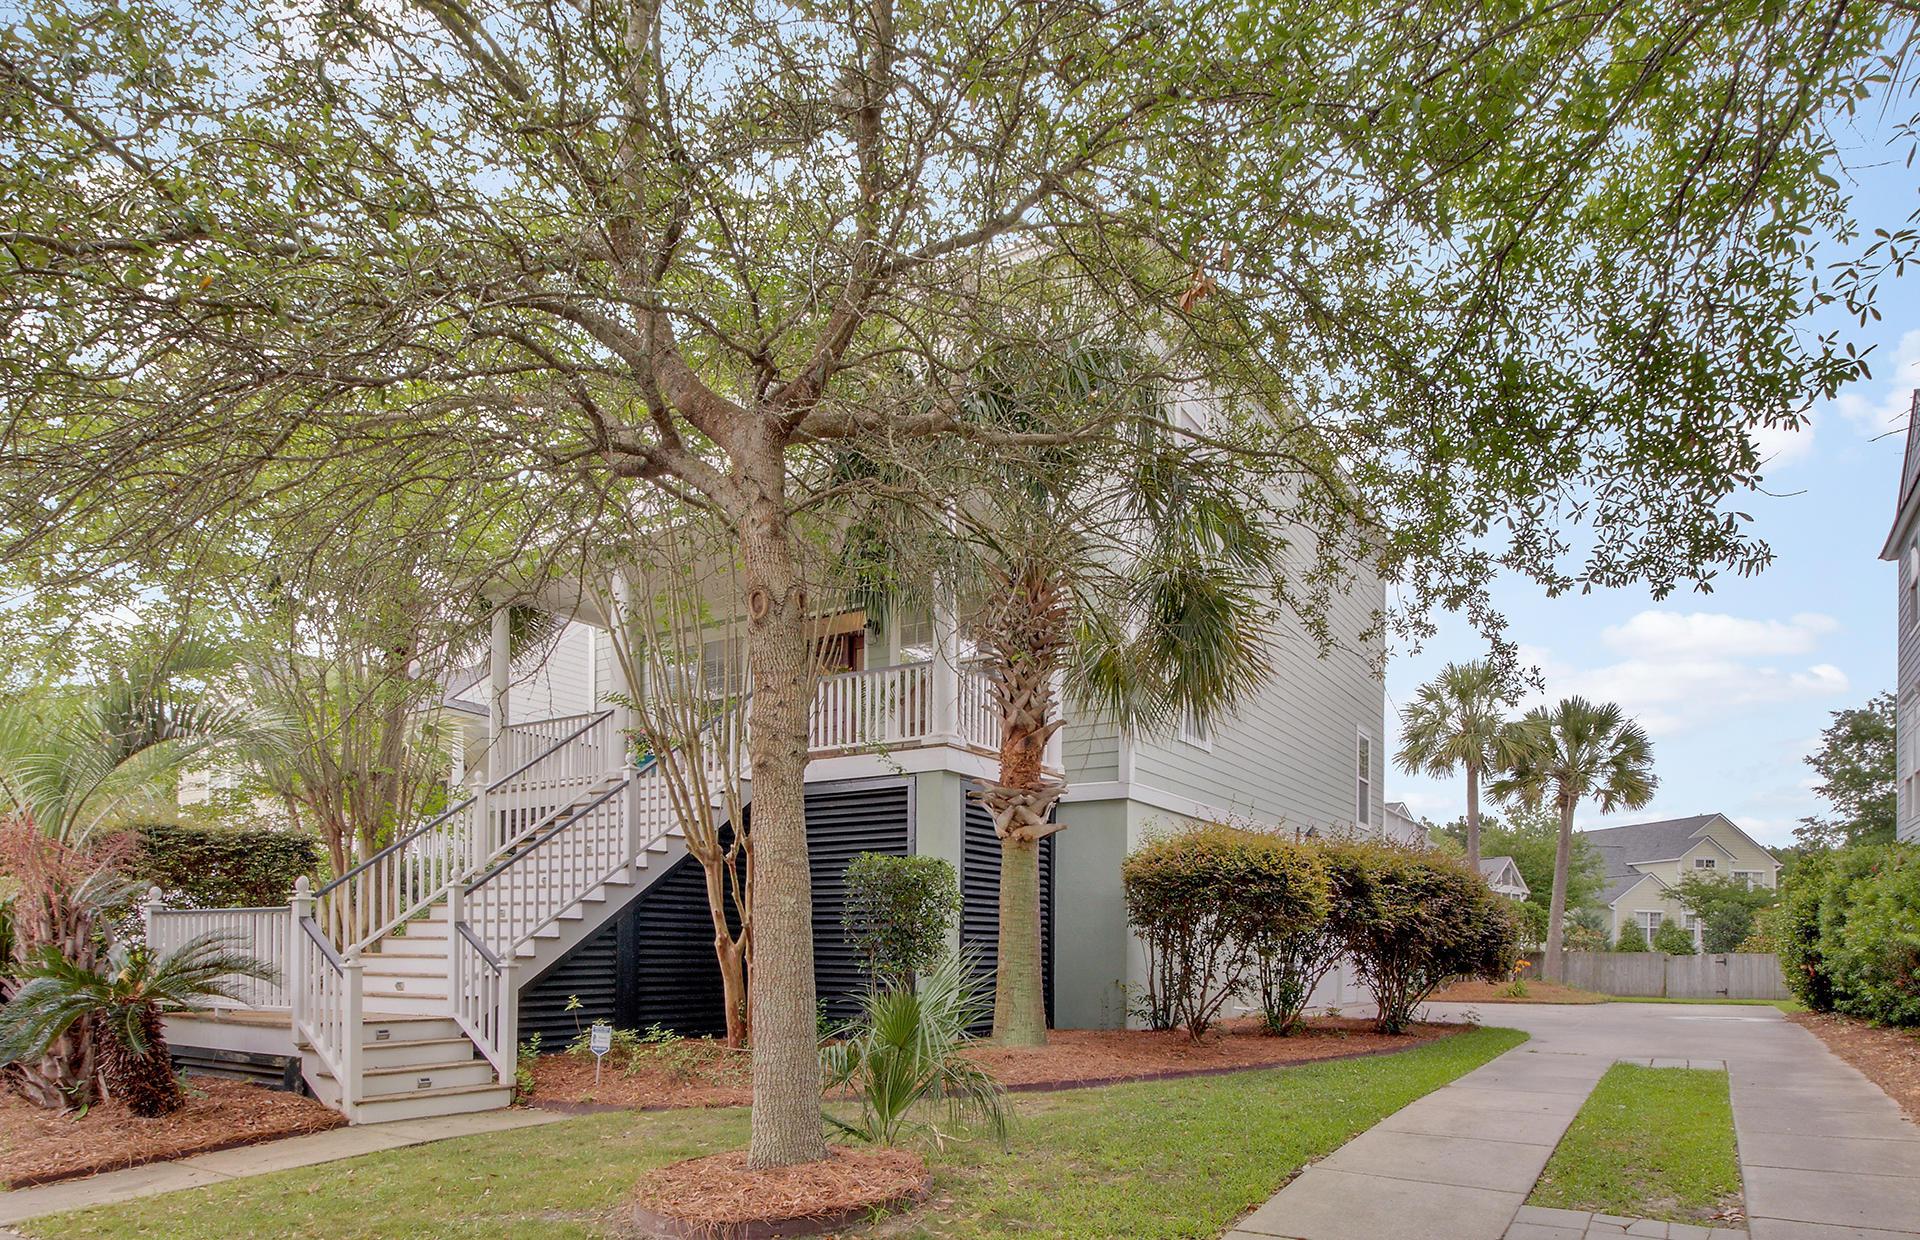 Daniel Island Homes For Sale - 306 Ladd, Charleston, SC - 2